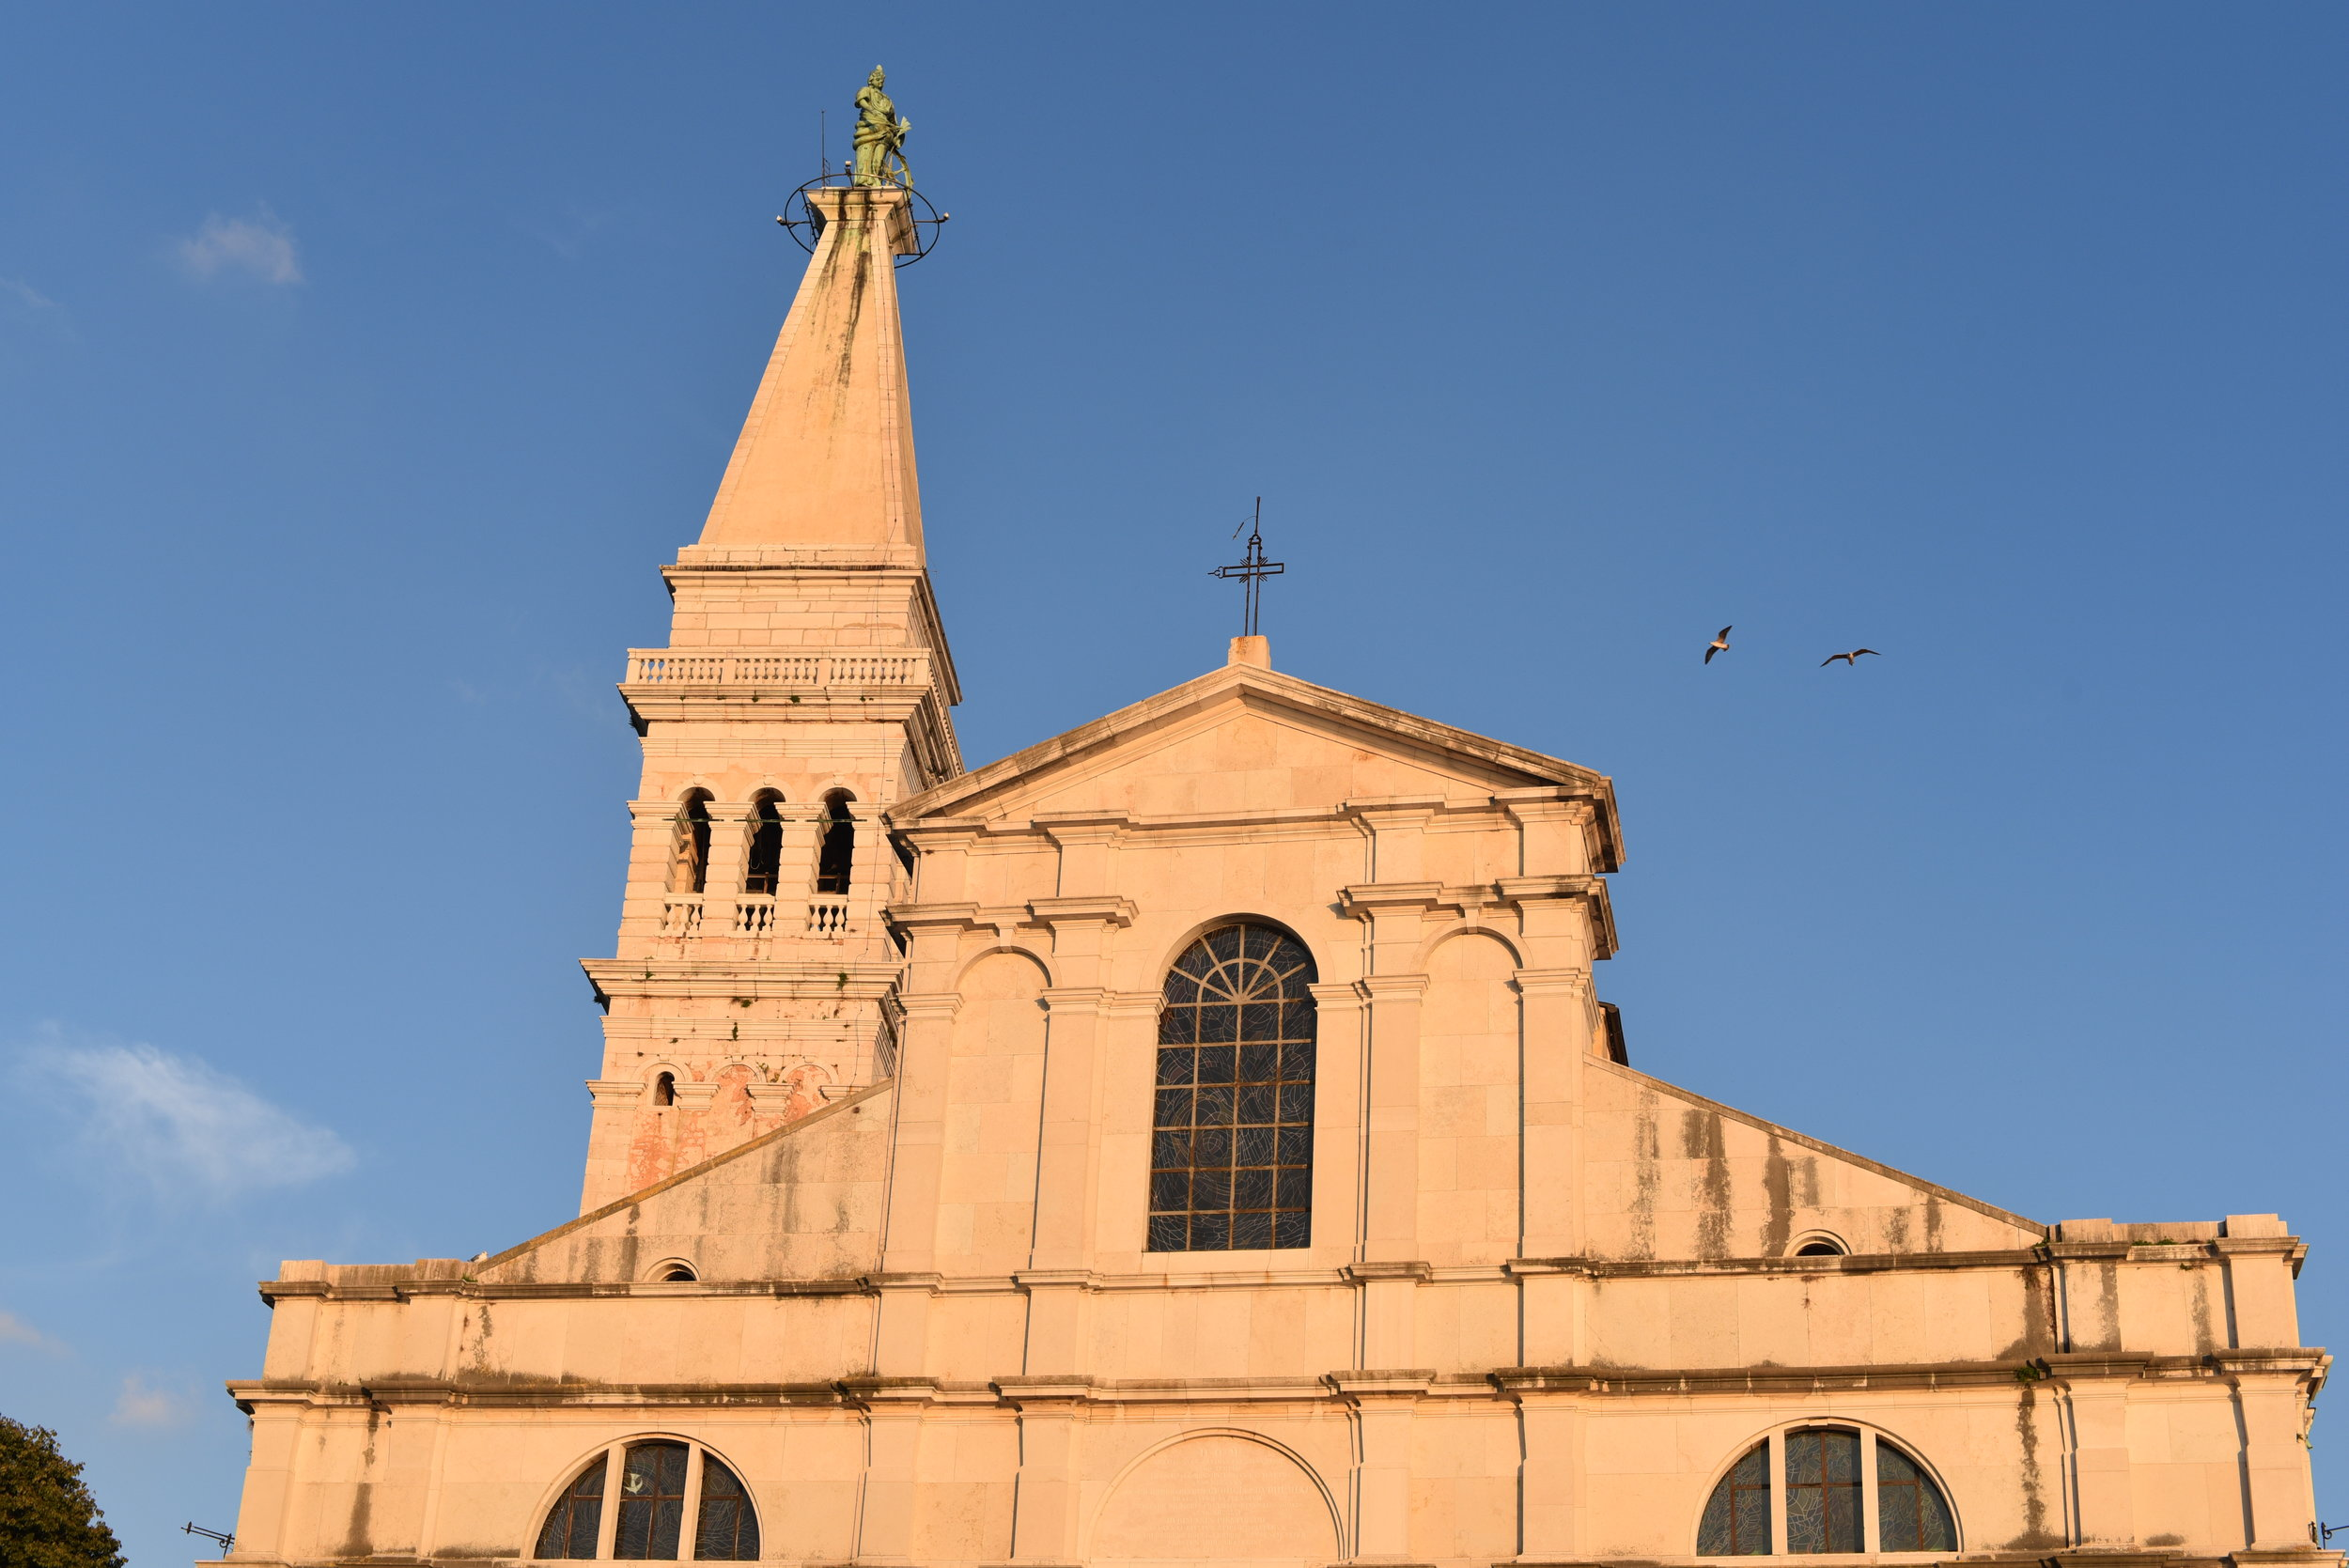 Church of St. Euphemia at sunset.